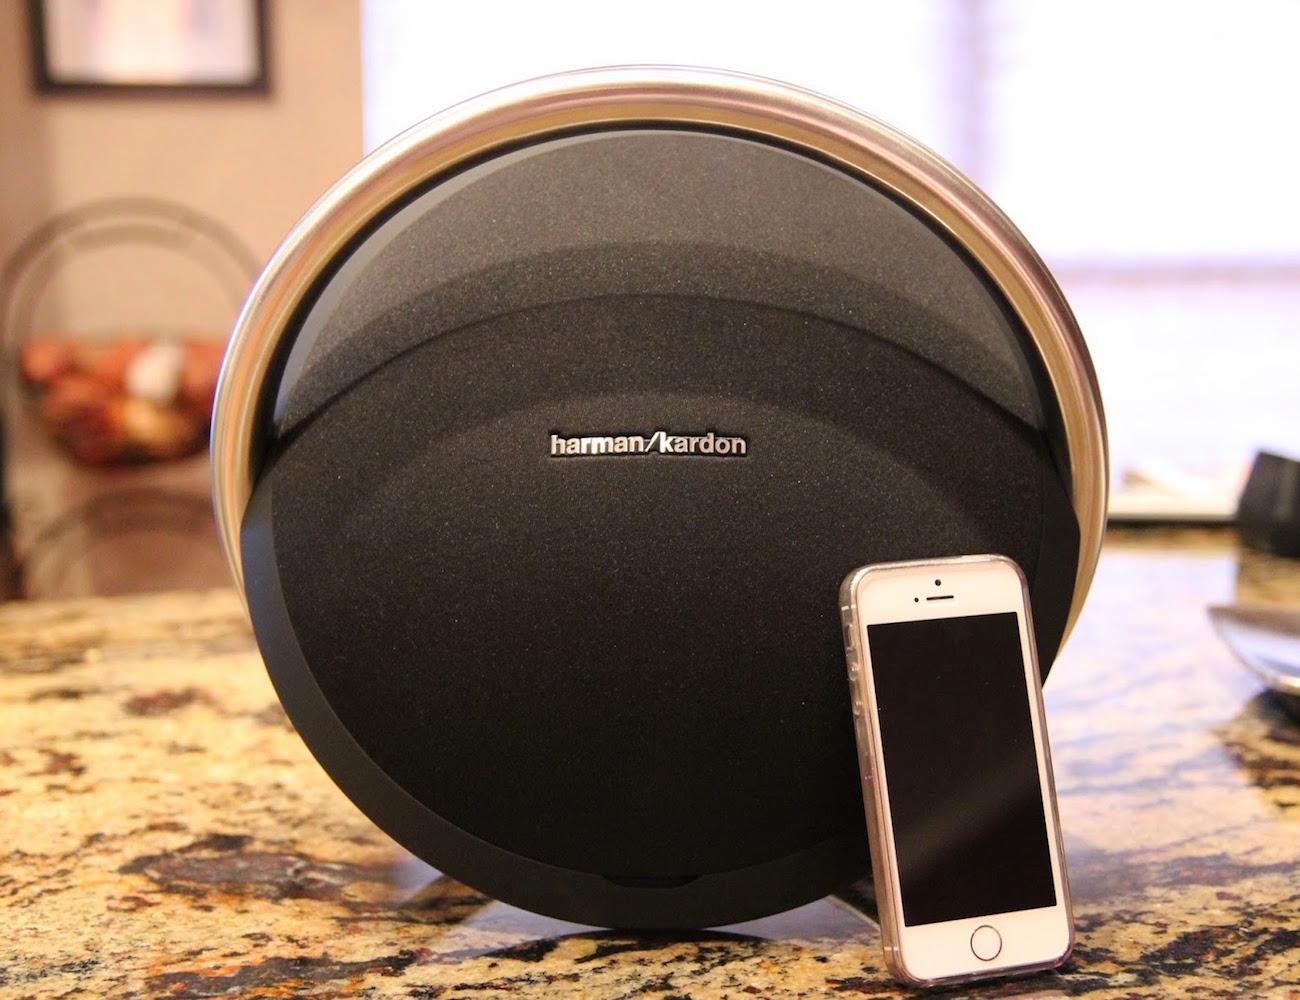 onyx studio portable wireless bluetooth speaker by harman. Black Bedroom Furniture Sets. Home Design Ideas